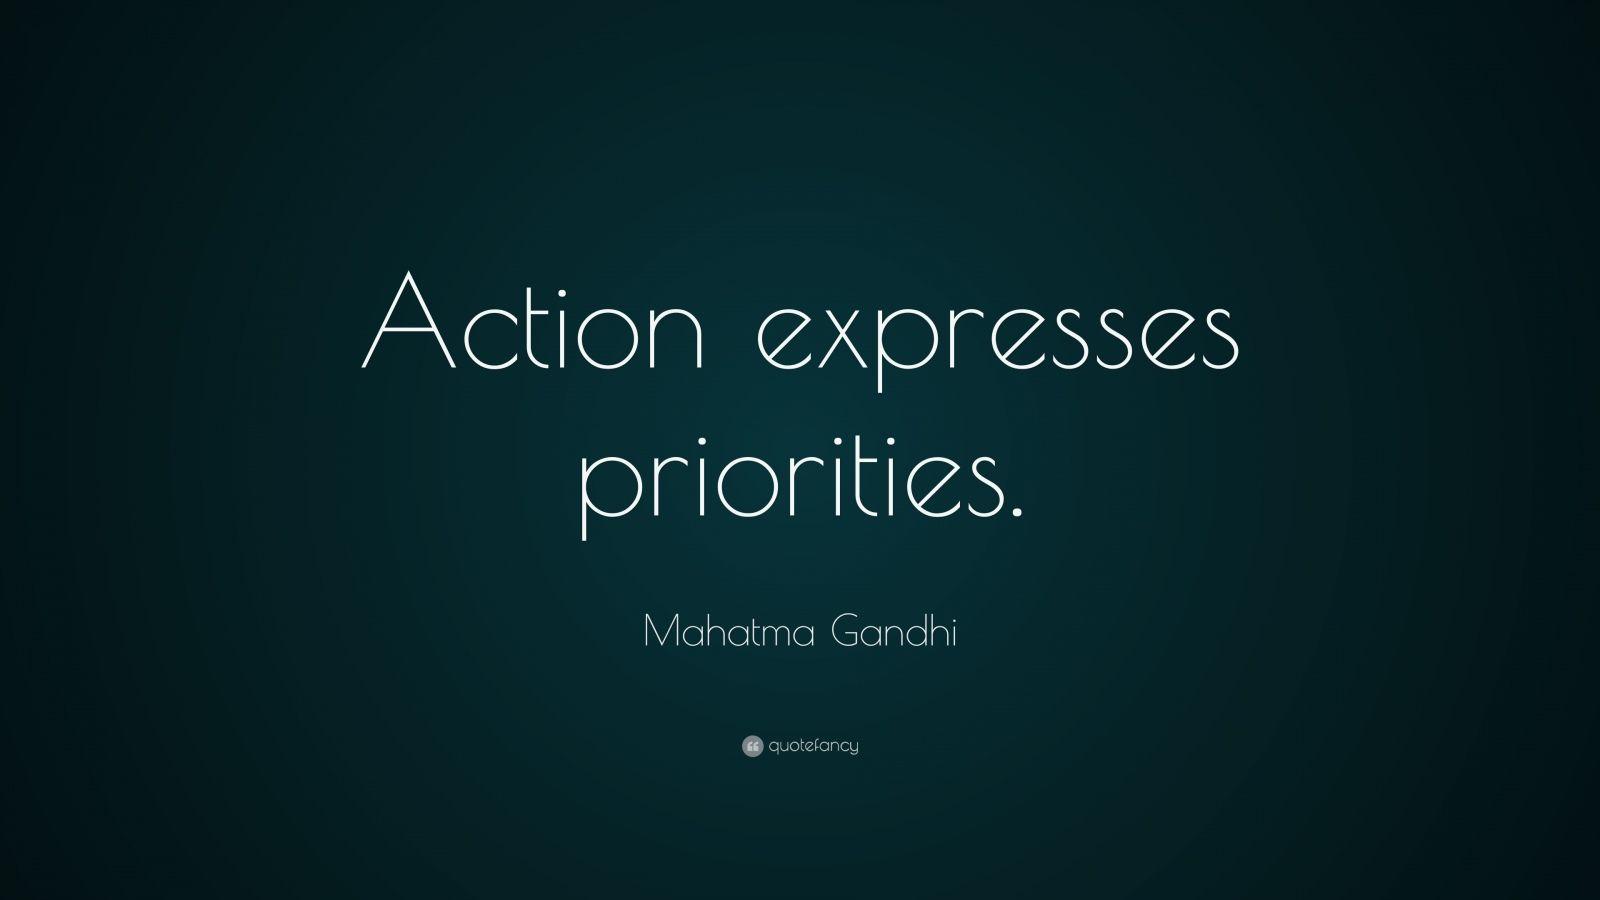 gandhi quotes wallpaper - photo #23